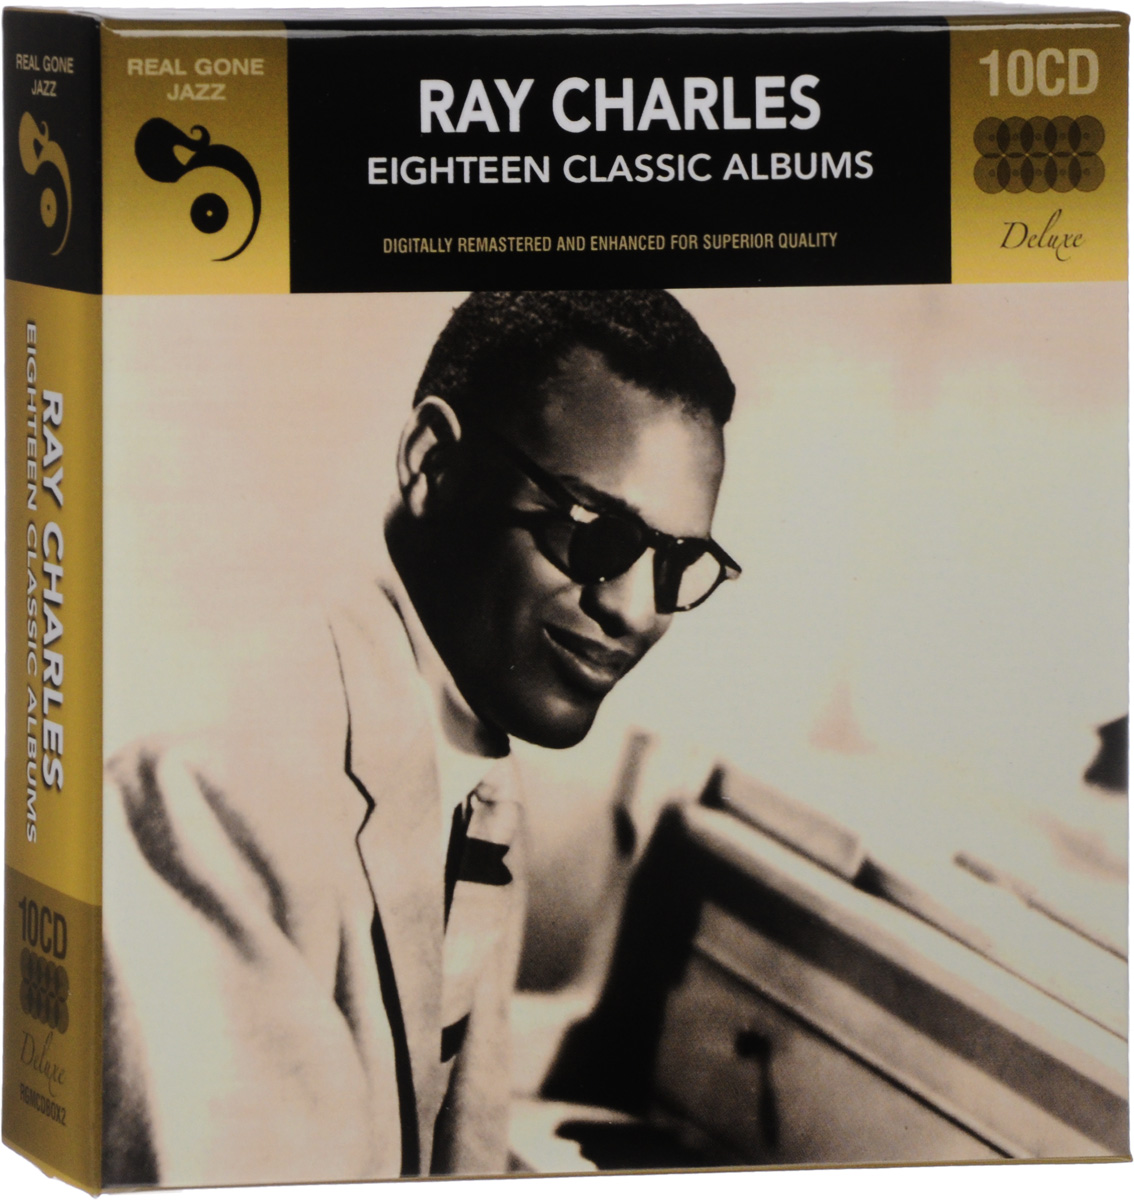 Рэй Чарльз,Милт Джексон,Бэтти Картер Ray Charles. Eighteen Classic Albums. Deluxe Edition (10 CD) рэй чарльз ray charles original album series 5 cd